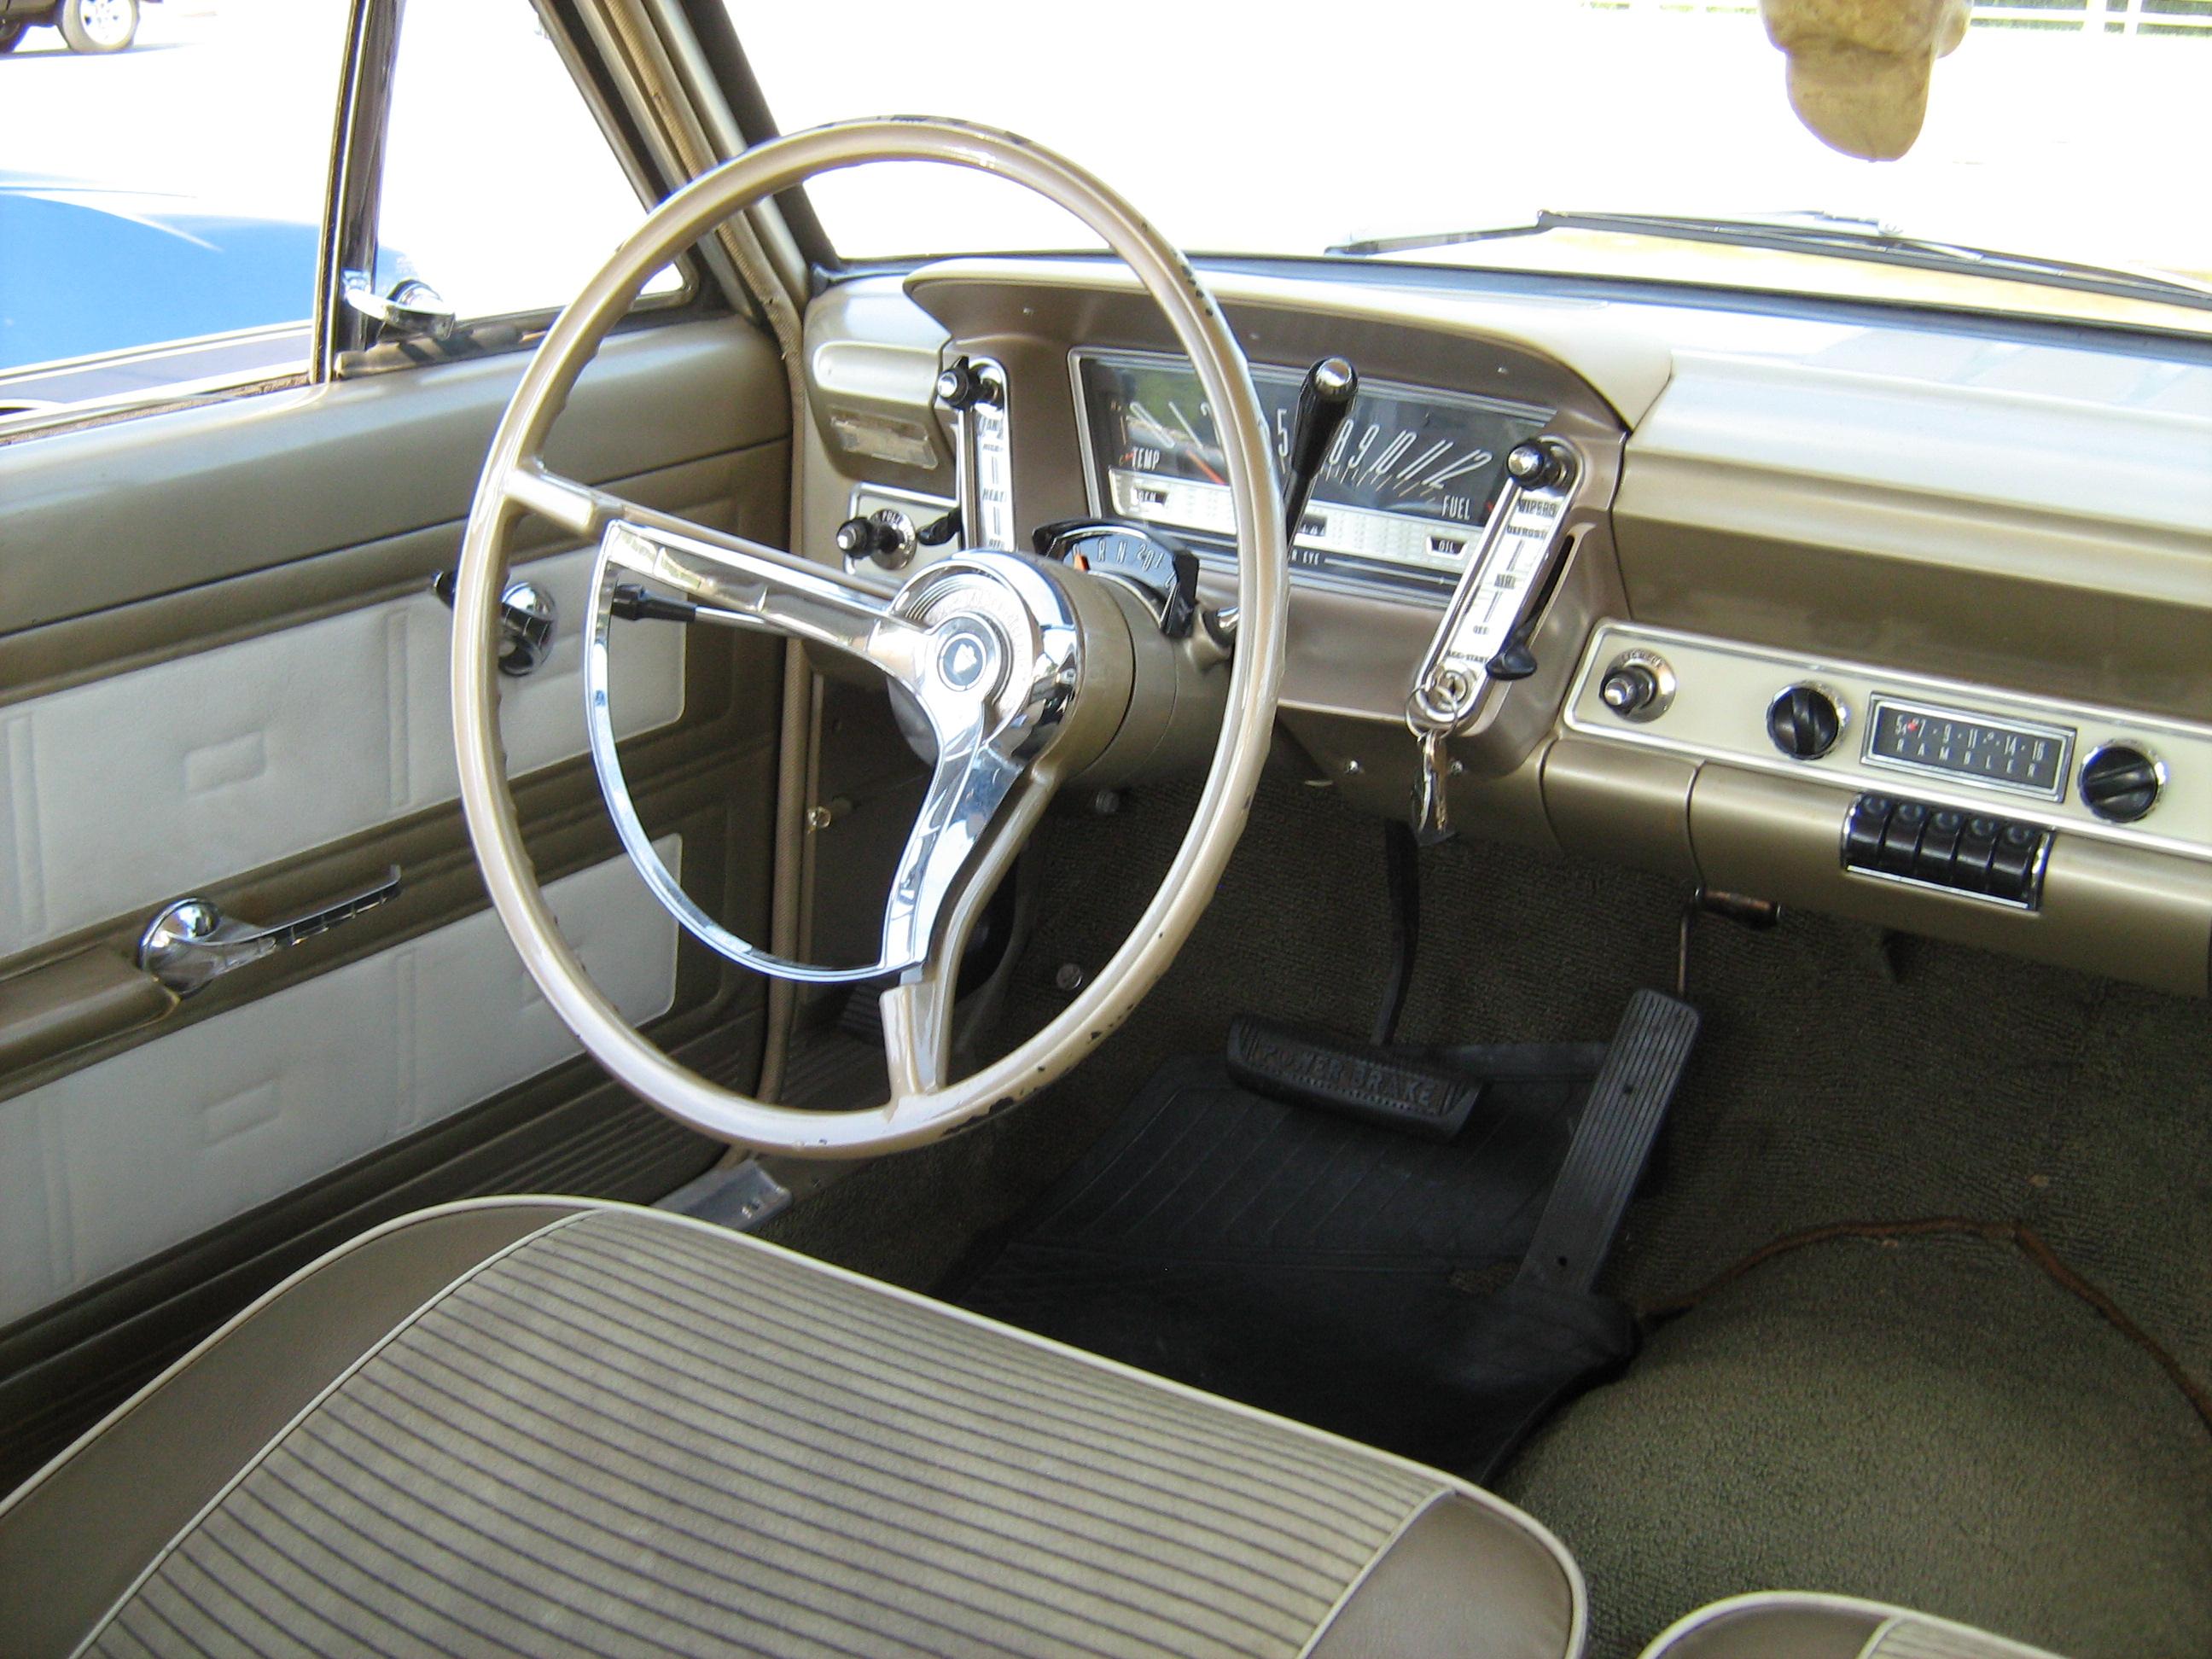 file 1963 rambler ambassador 880 sedan gold white k wikimedia commons. Black Bedroom Furniture Sets. Home Design Ideas